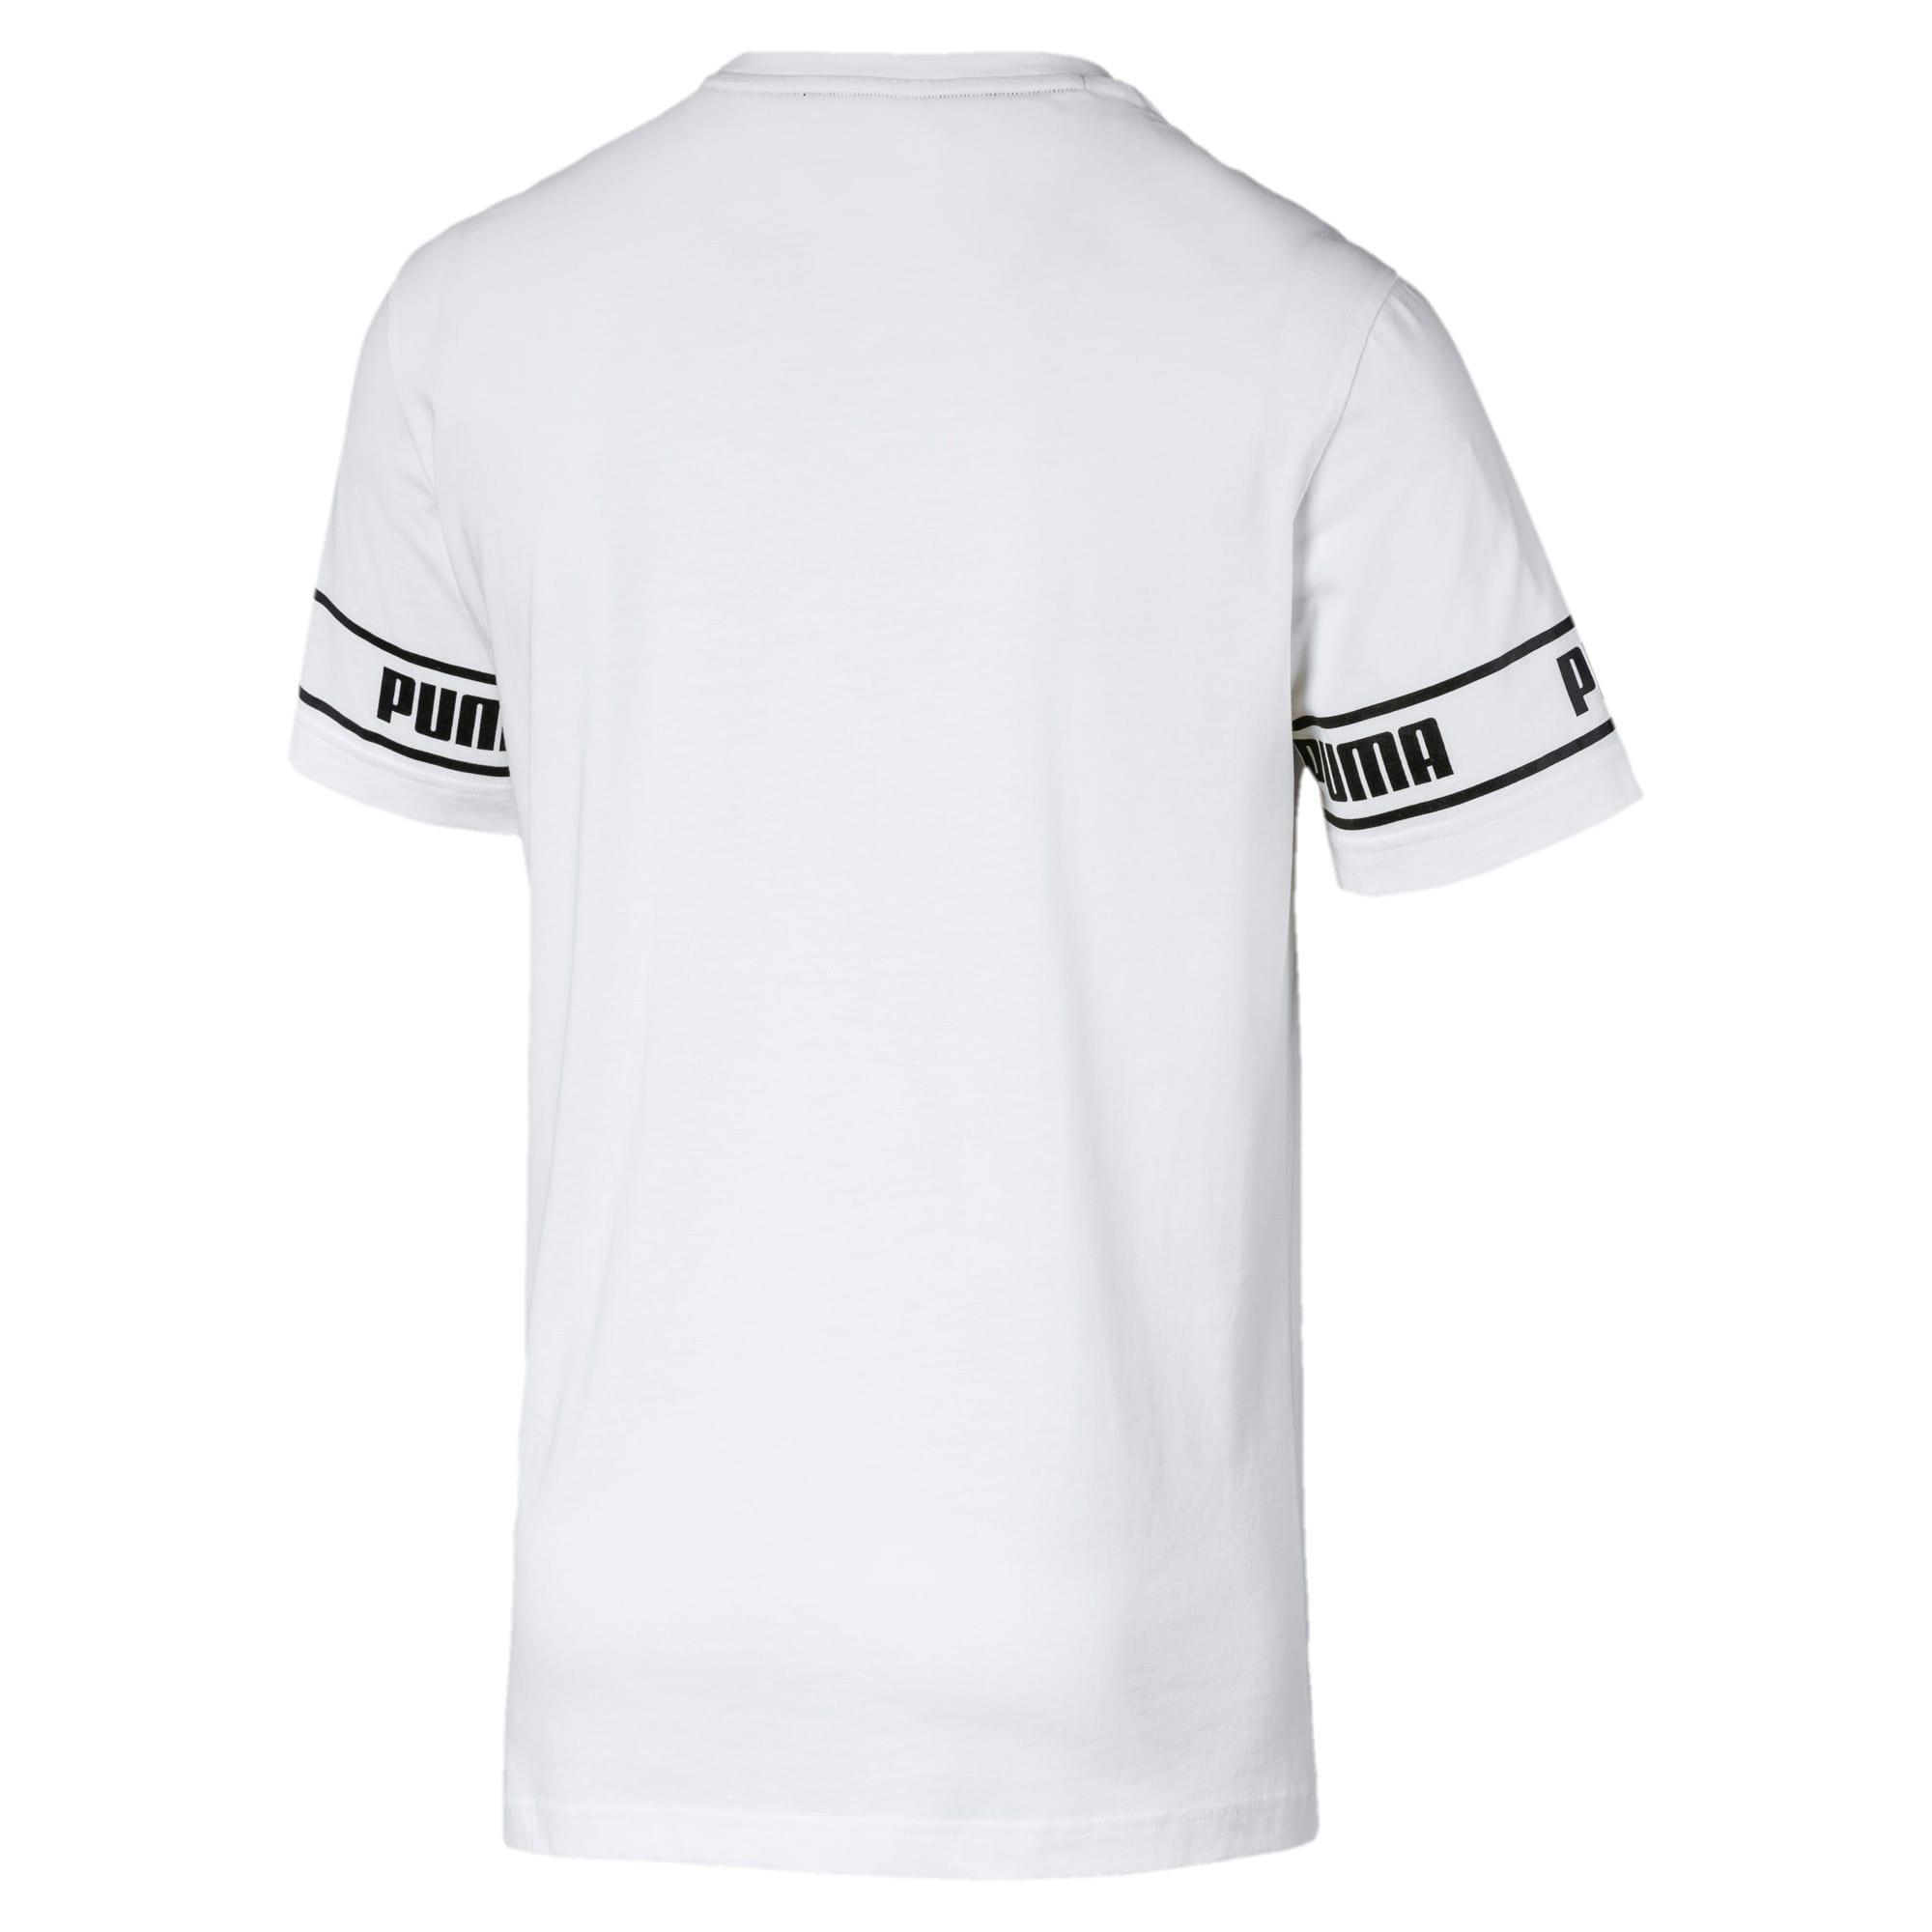 Thumbnail 5 of Amplified Men's Big Logo Tee, Puma White, medium